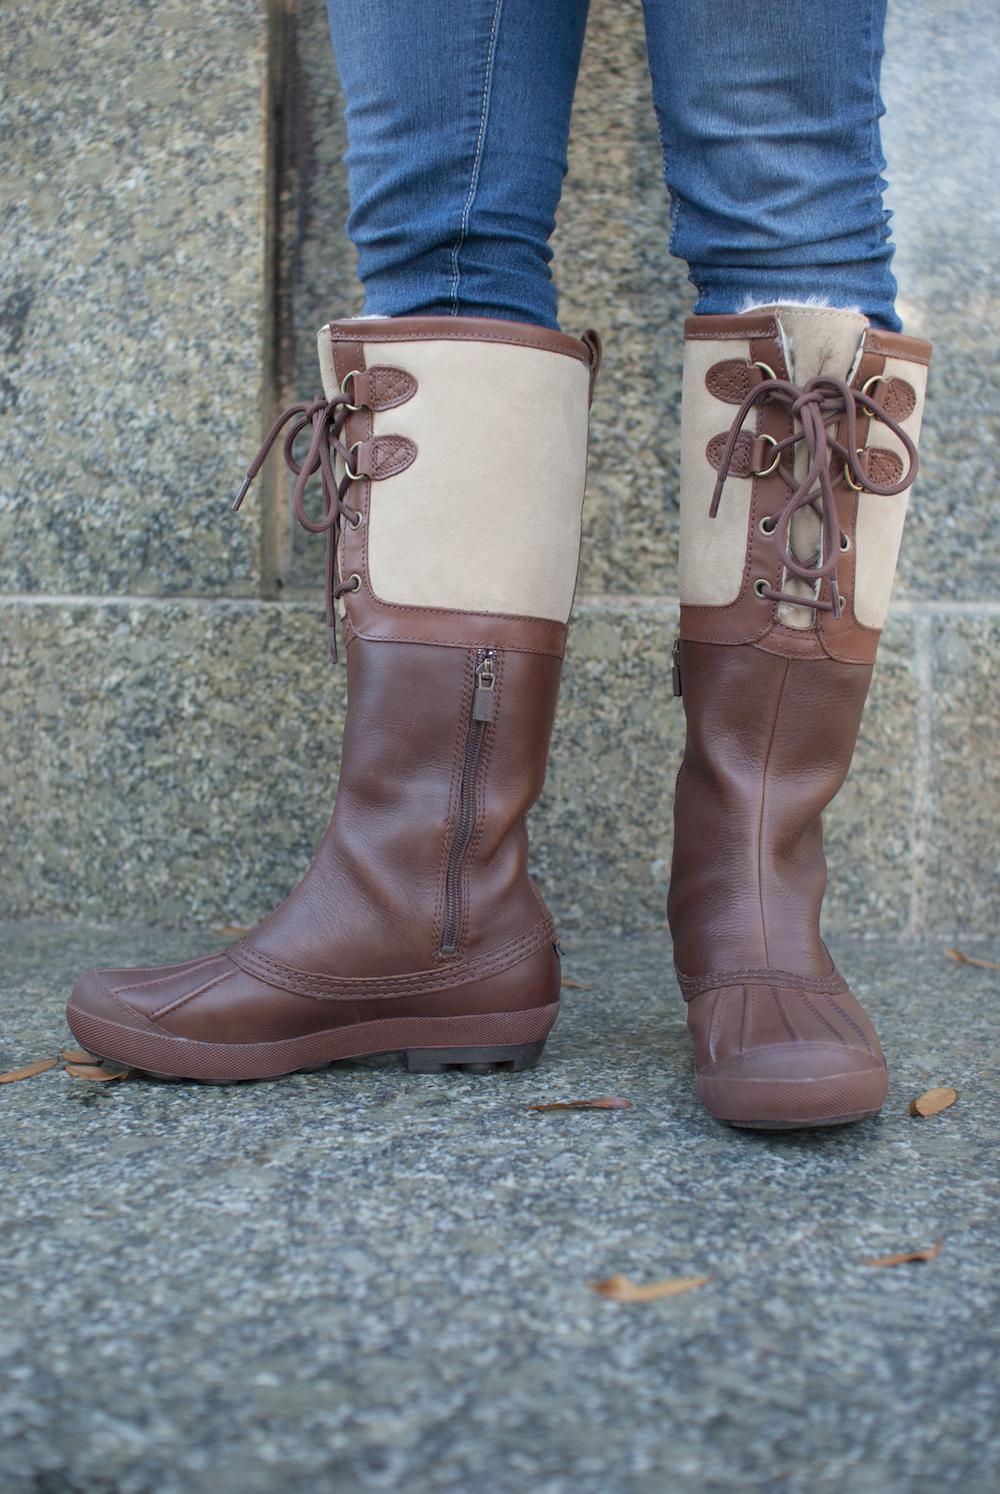 ugg australia 39 s waterproof leather duck boot for women. Black Bedroom Furniture Sets. Home Design Ideas